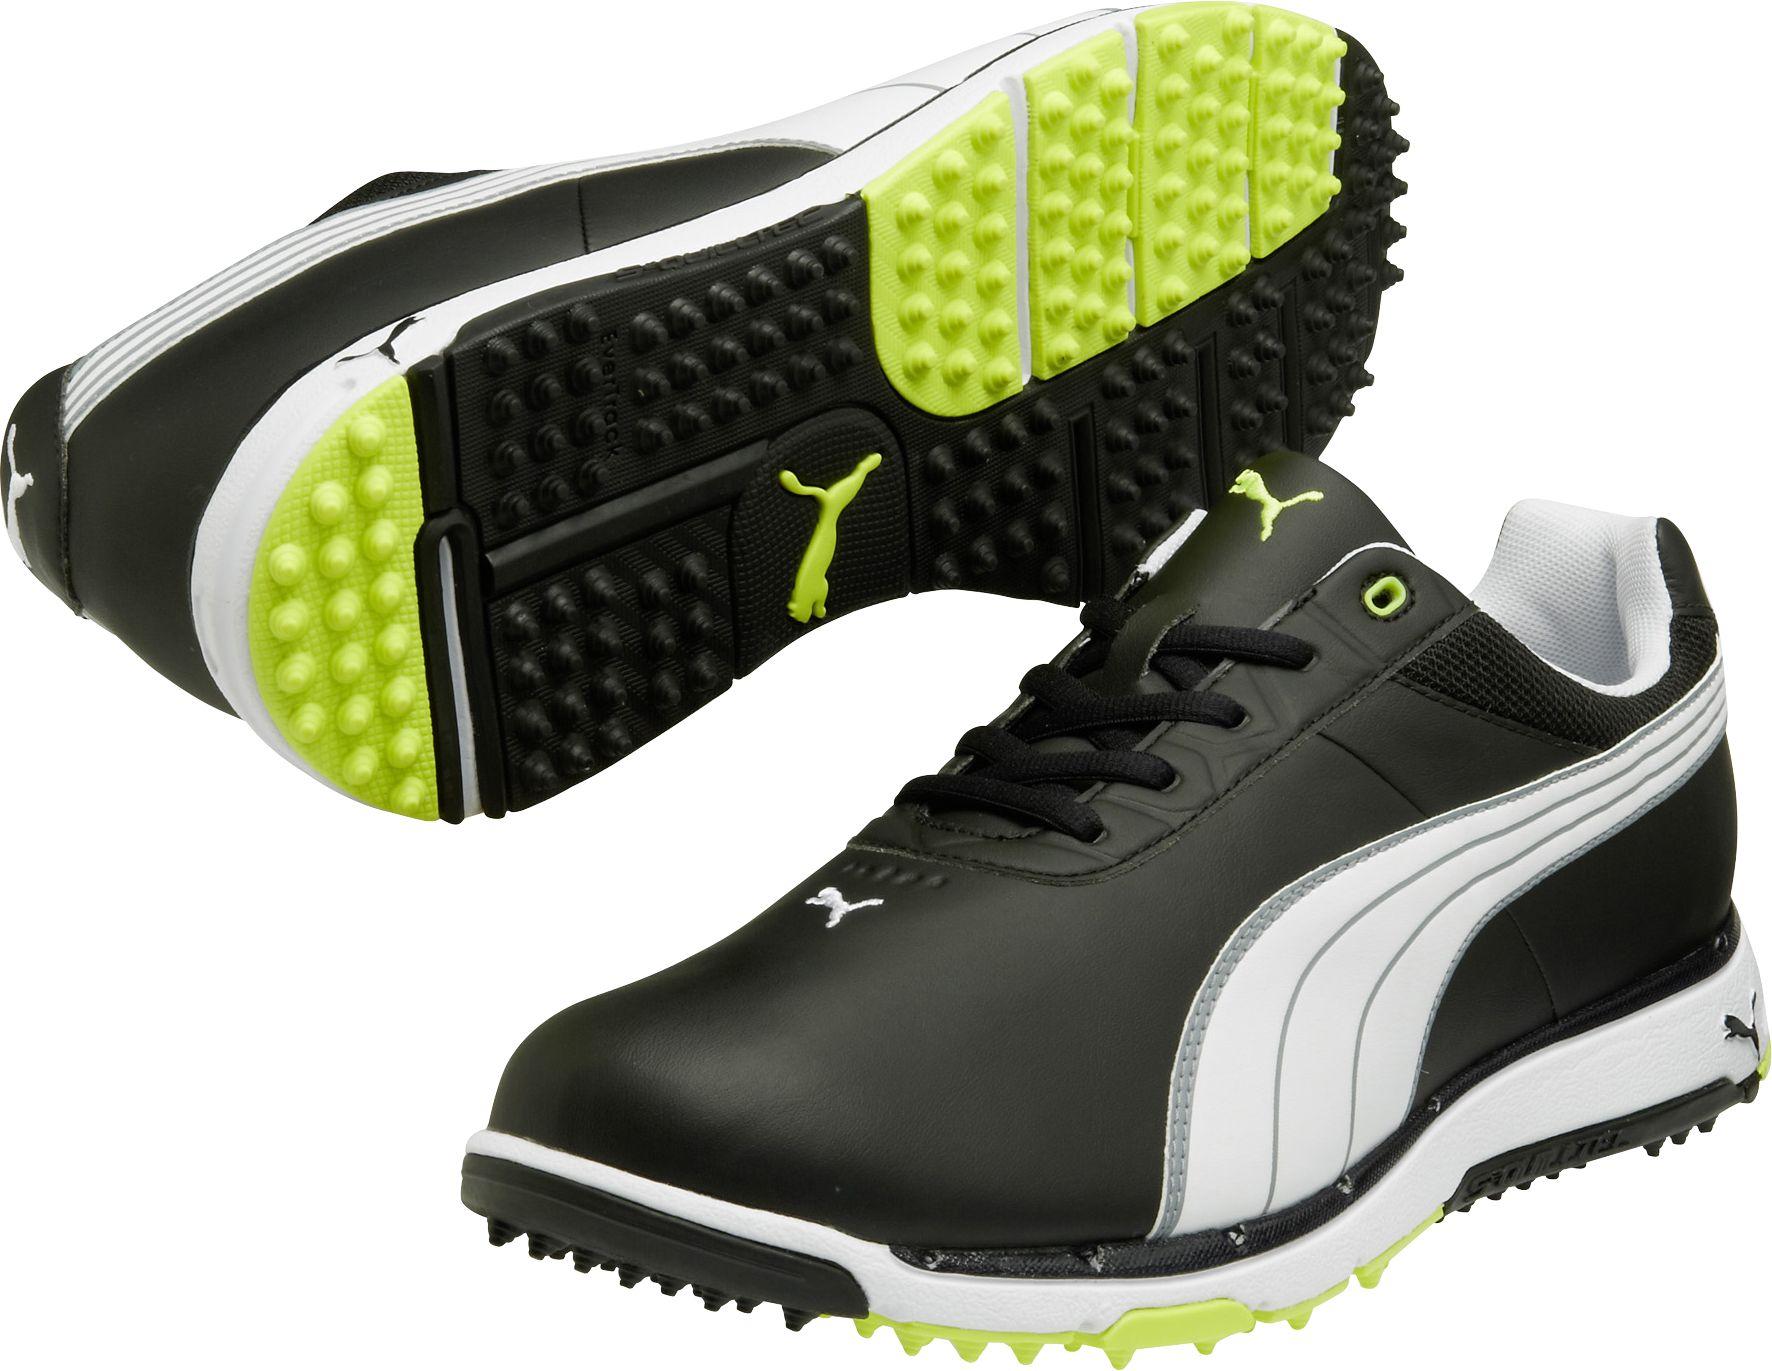 PUMA FAAS Grip 2.0 Golf Shoes  1ab760b34